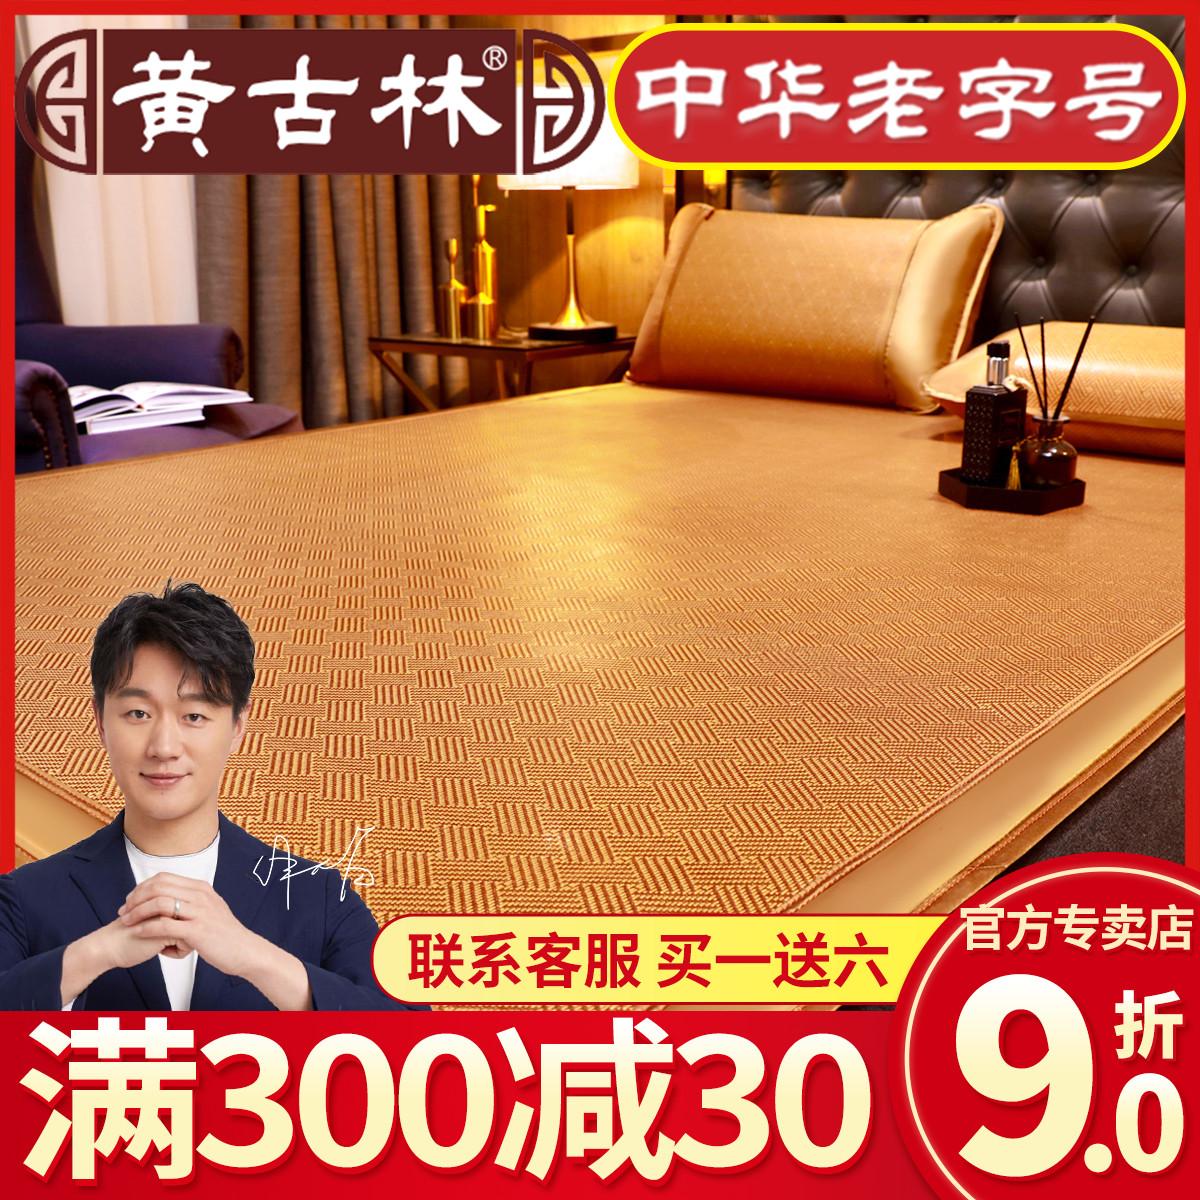 Декоративные одеяла и подушки / Прикроватные коврики Артикул 552739821037